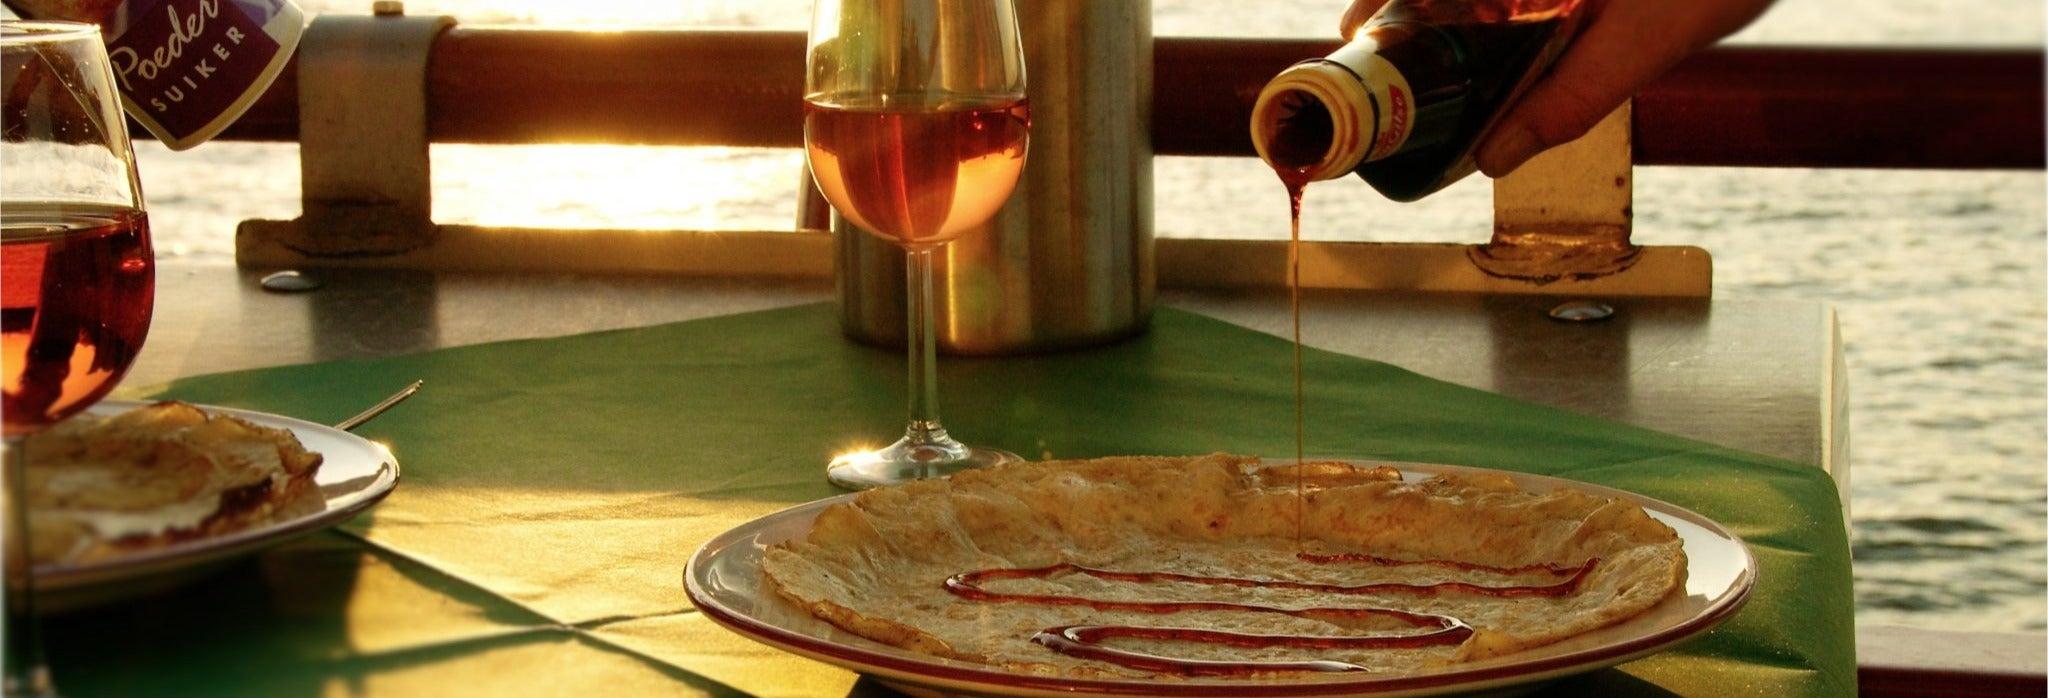 Pancake Cruise por Ámsterdam